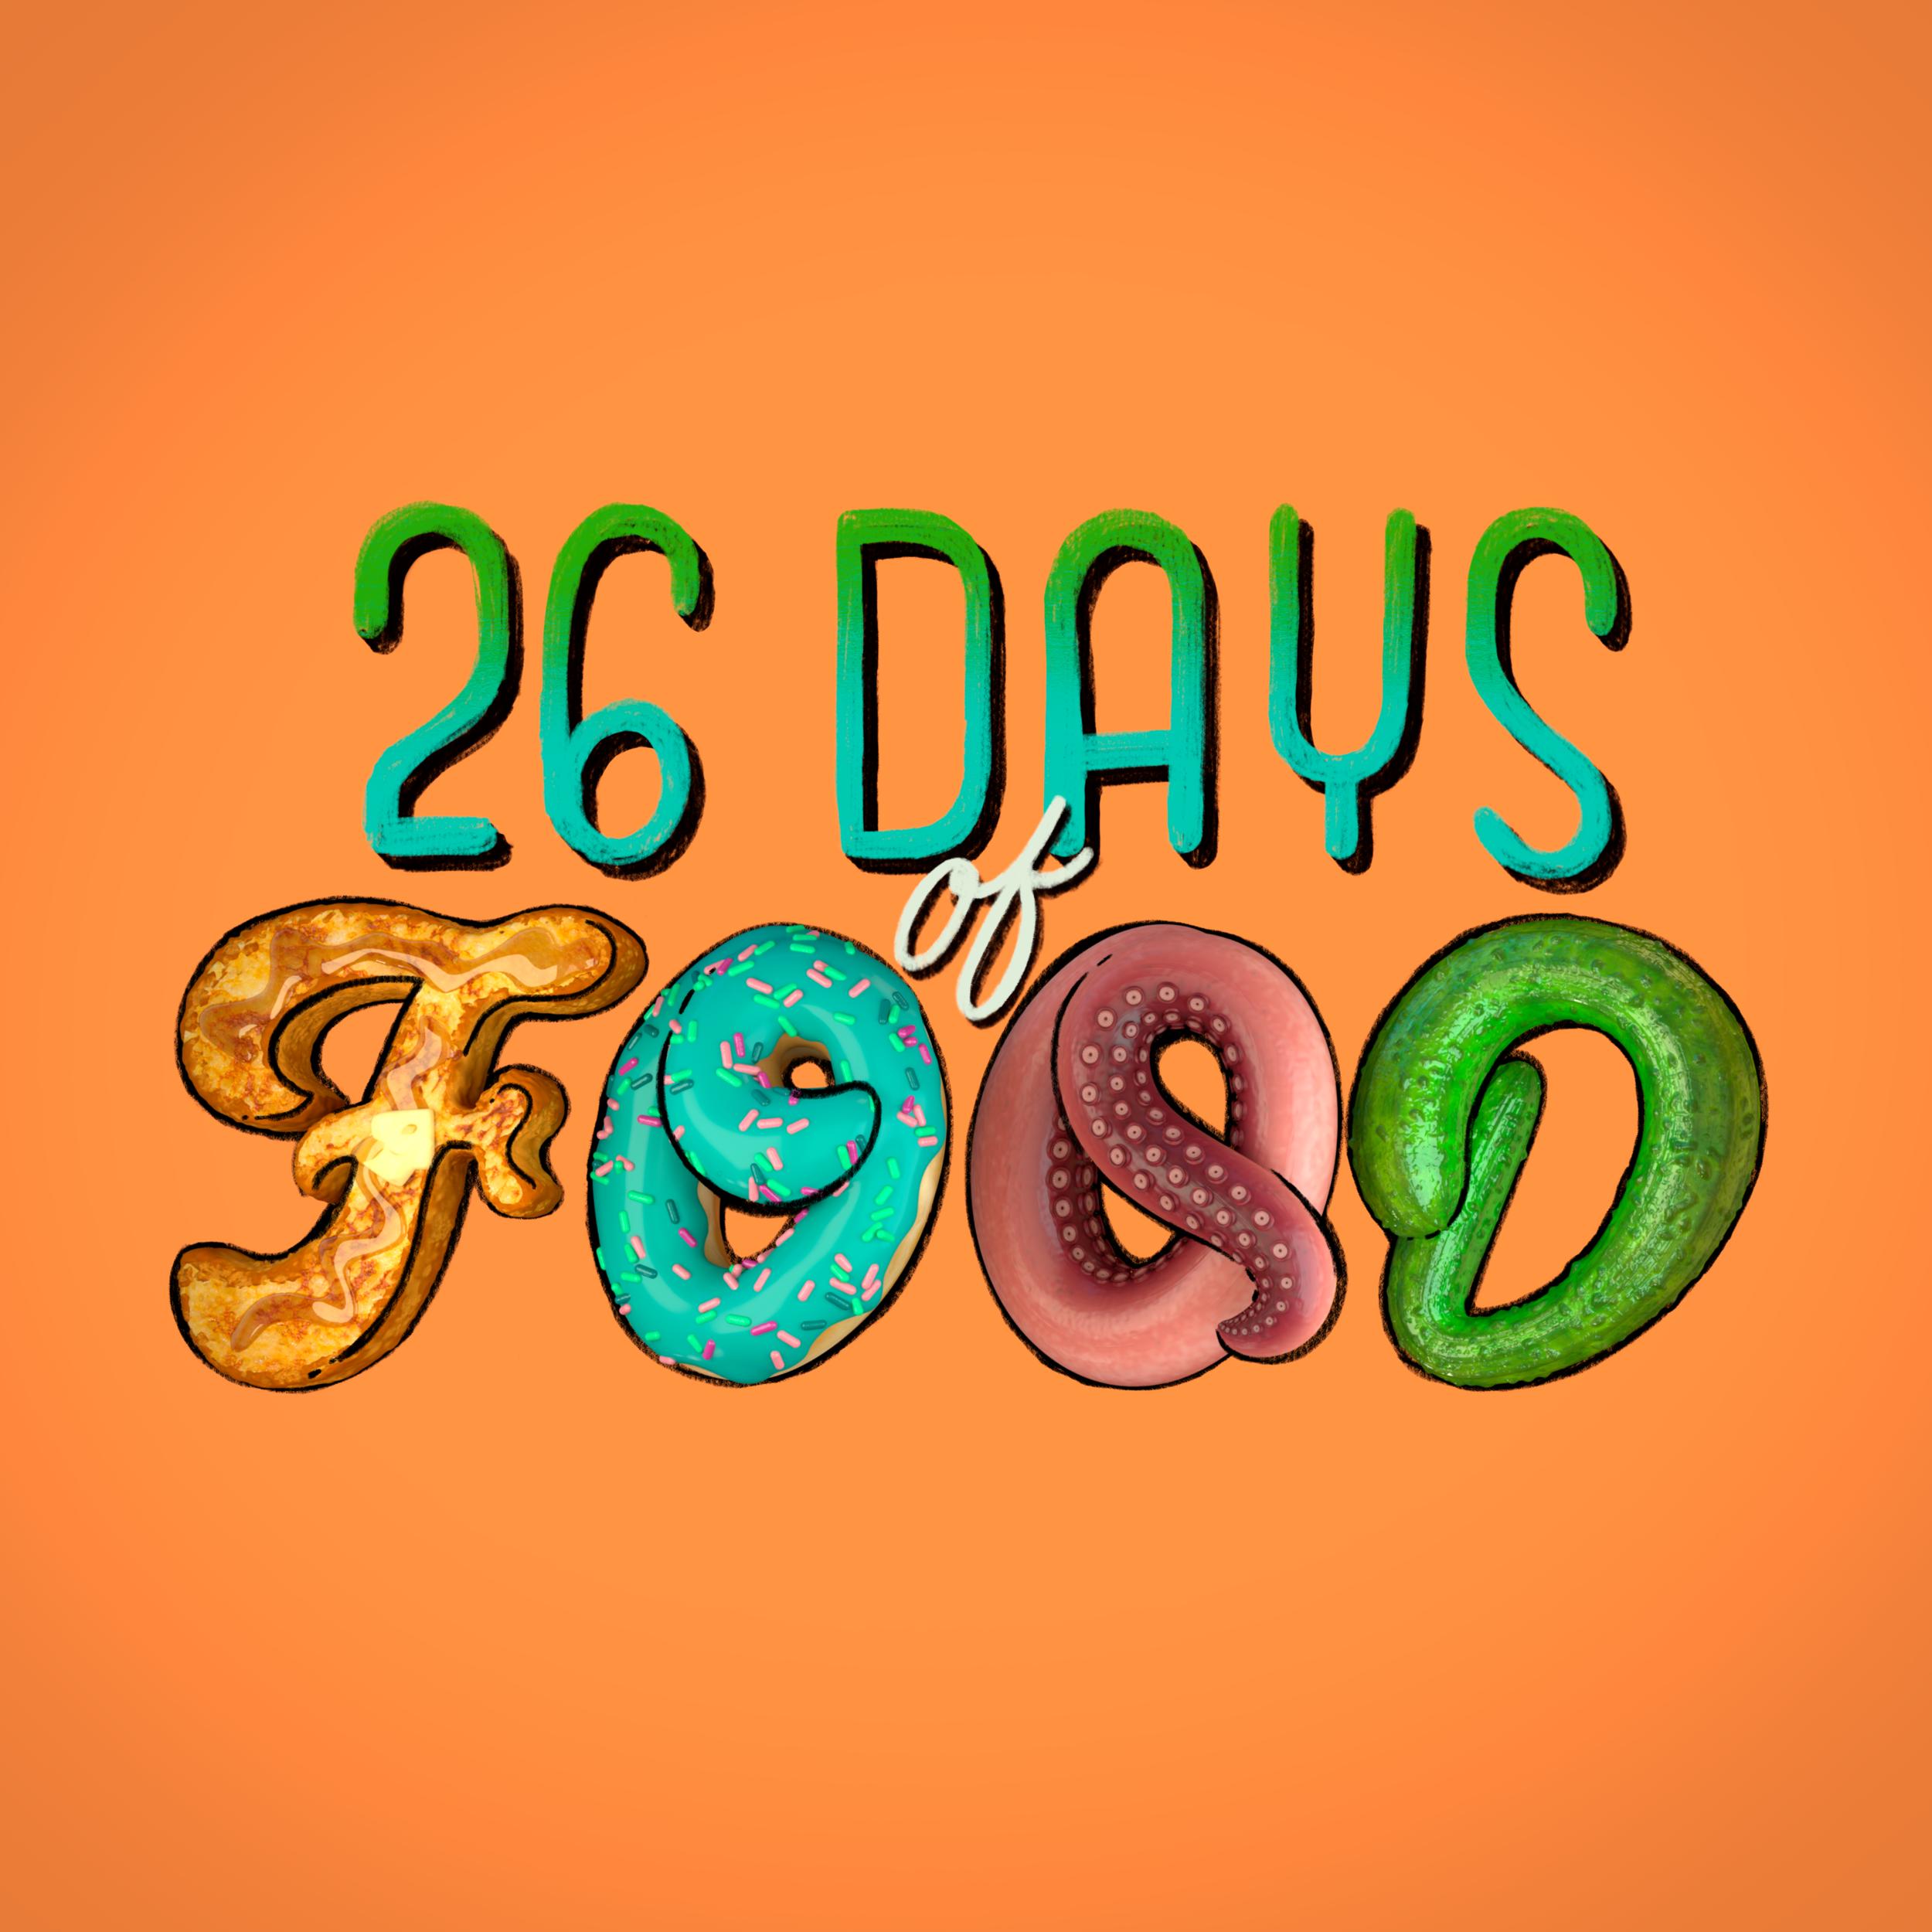 26daysoffoodLOGO2.png